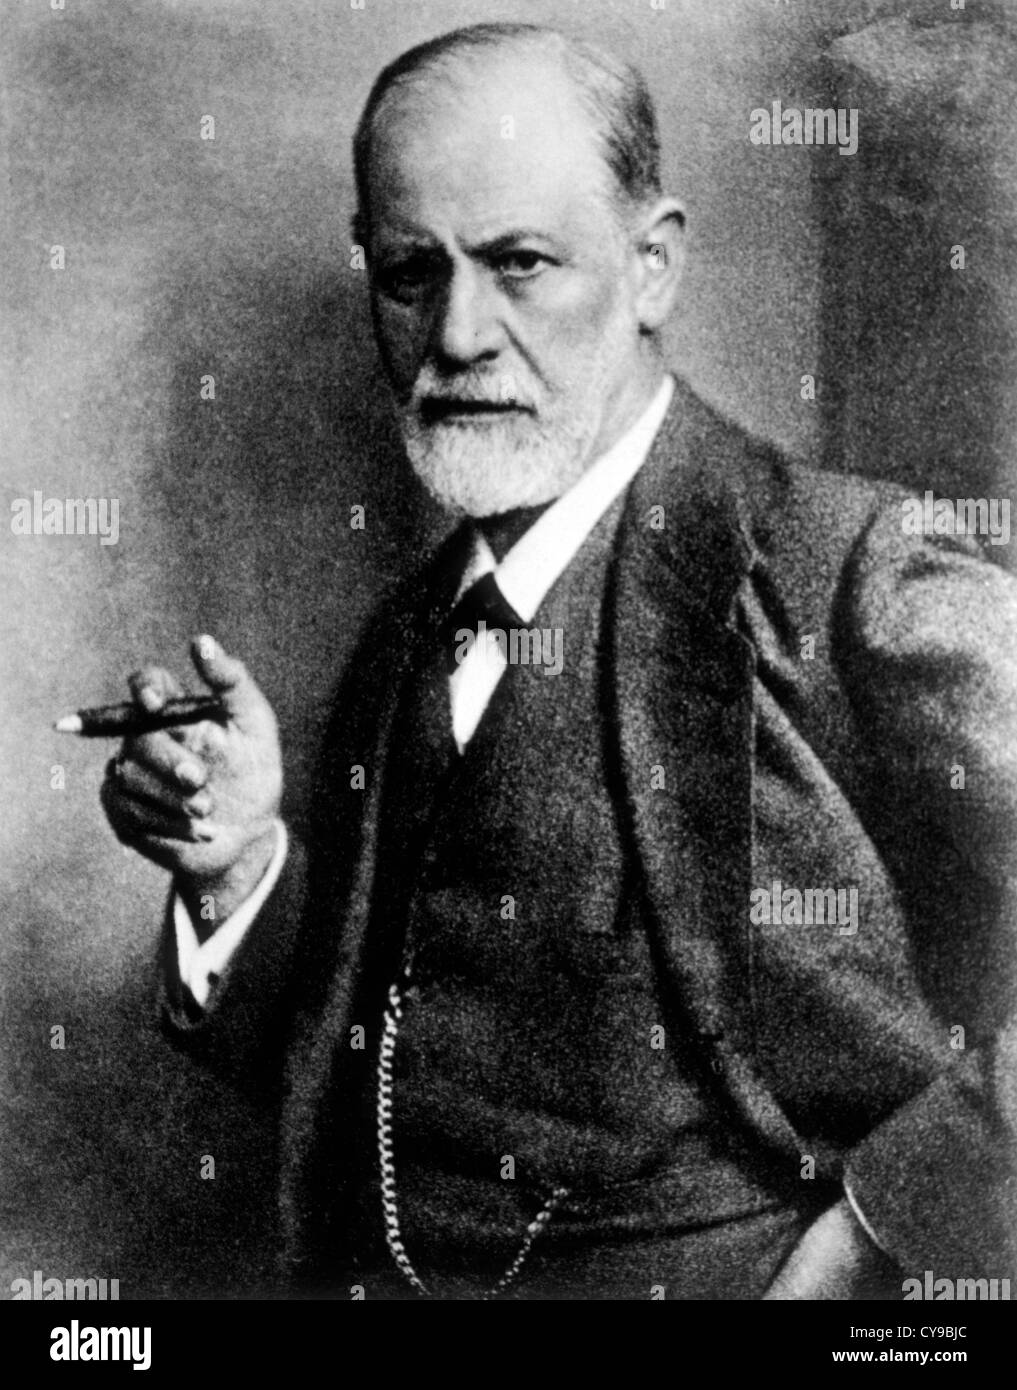 Sigmund Freud (1856-1939), Austrian Psychiatrist, Founder of Psychoanalysis, Circa 1921 - Stock Image